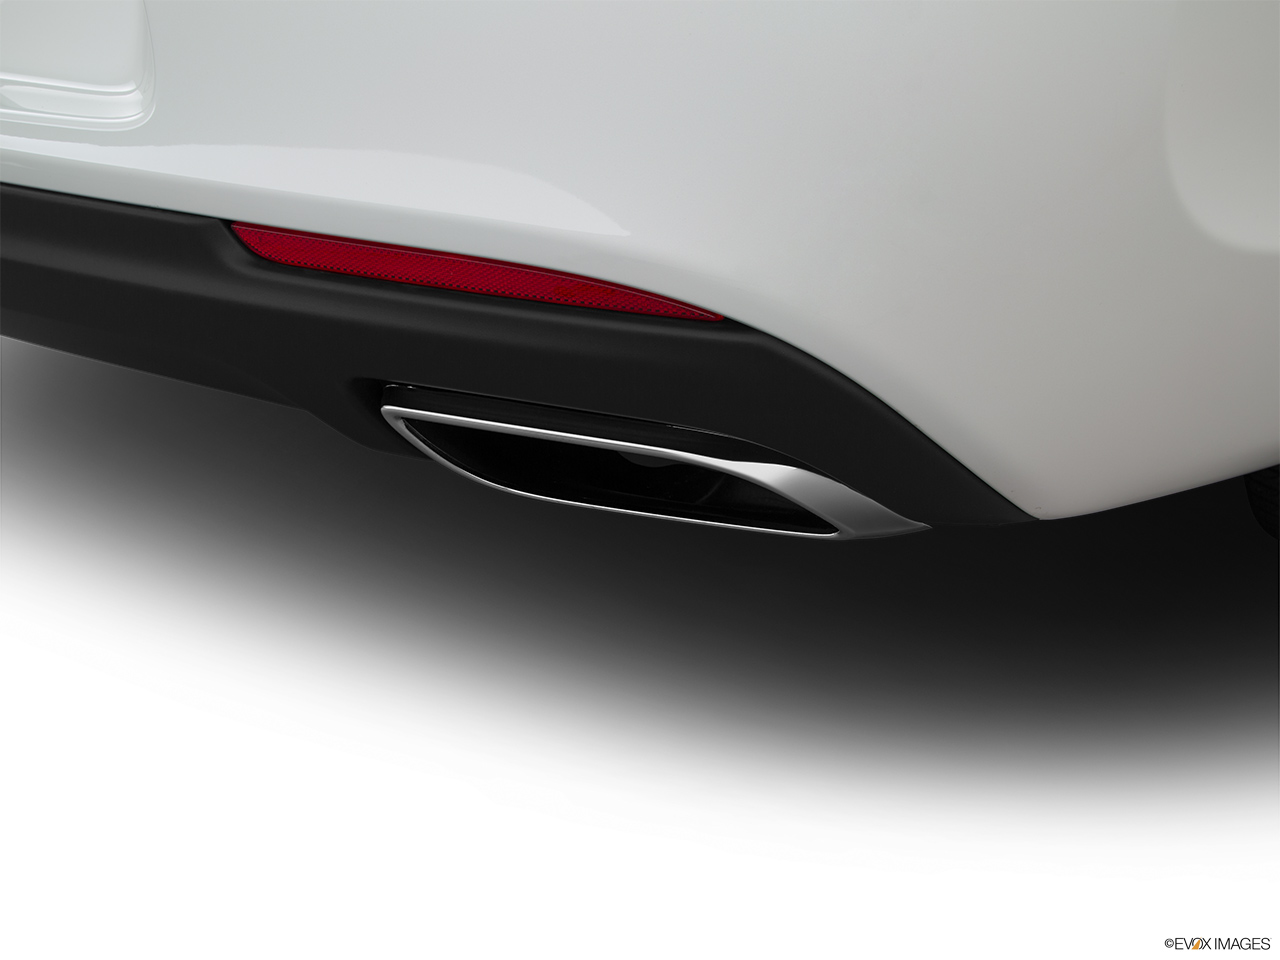 2015 Chrysler 300 Limited Awd Sedan Chrome Tip Exhaust Pipe